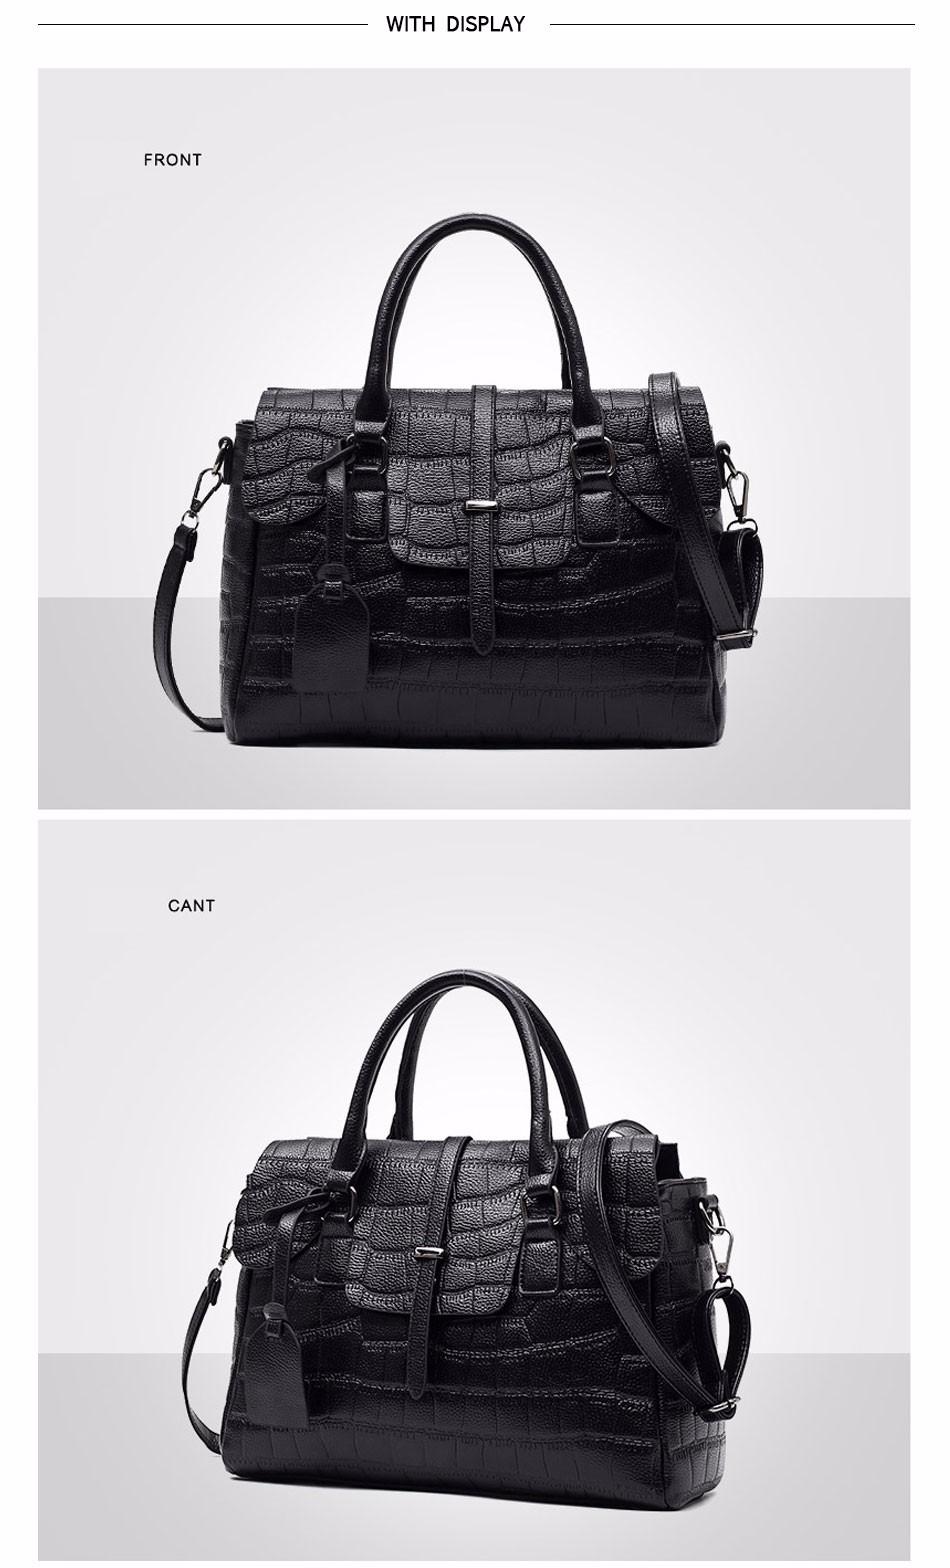 High Quality PU Leather Women's Handbags Shoulder Bag Ladies Hand Bags Stone Casual Women Bag Large Capacity Handbag 17 Sac 10